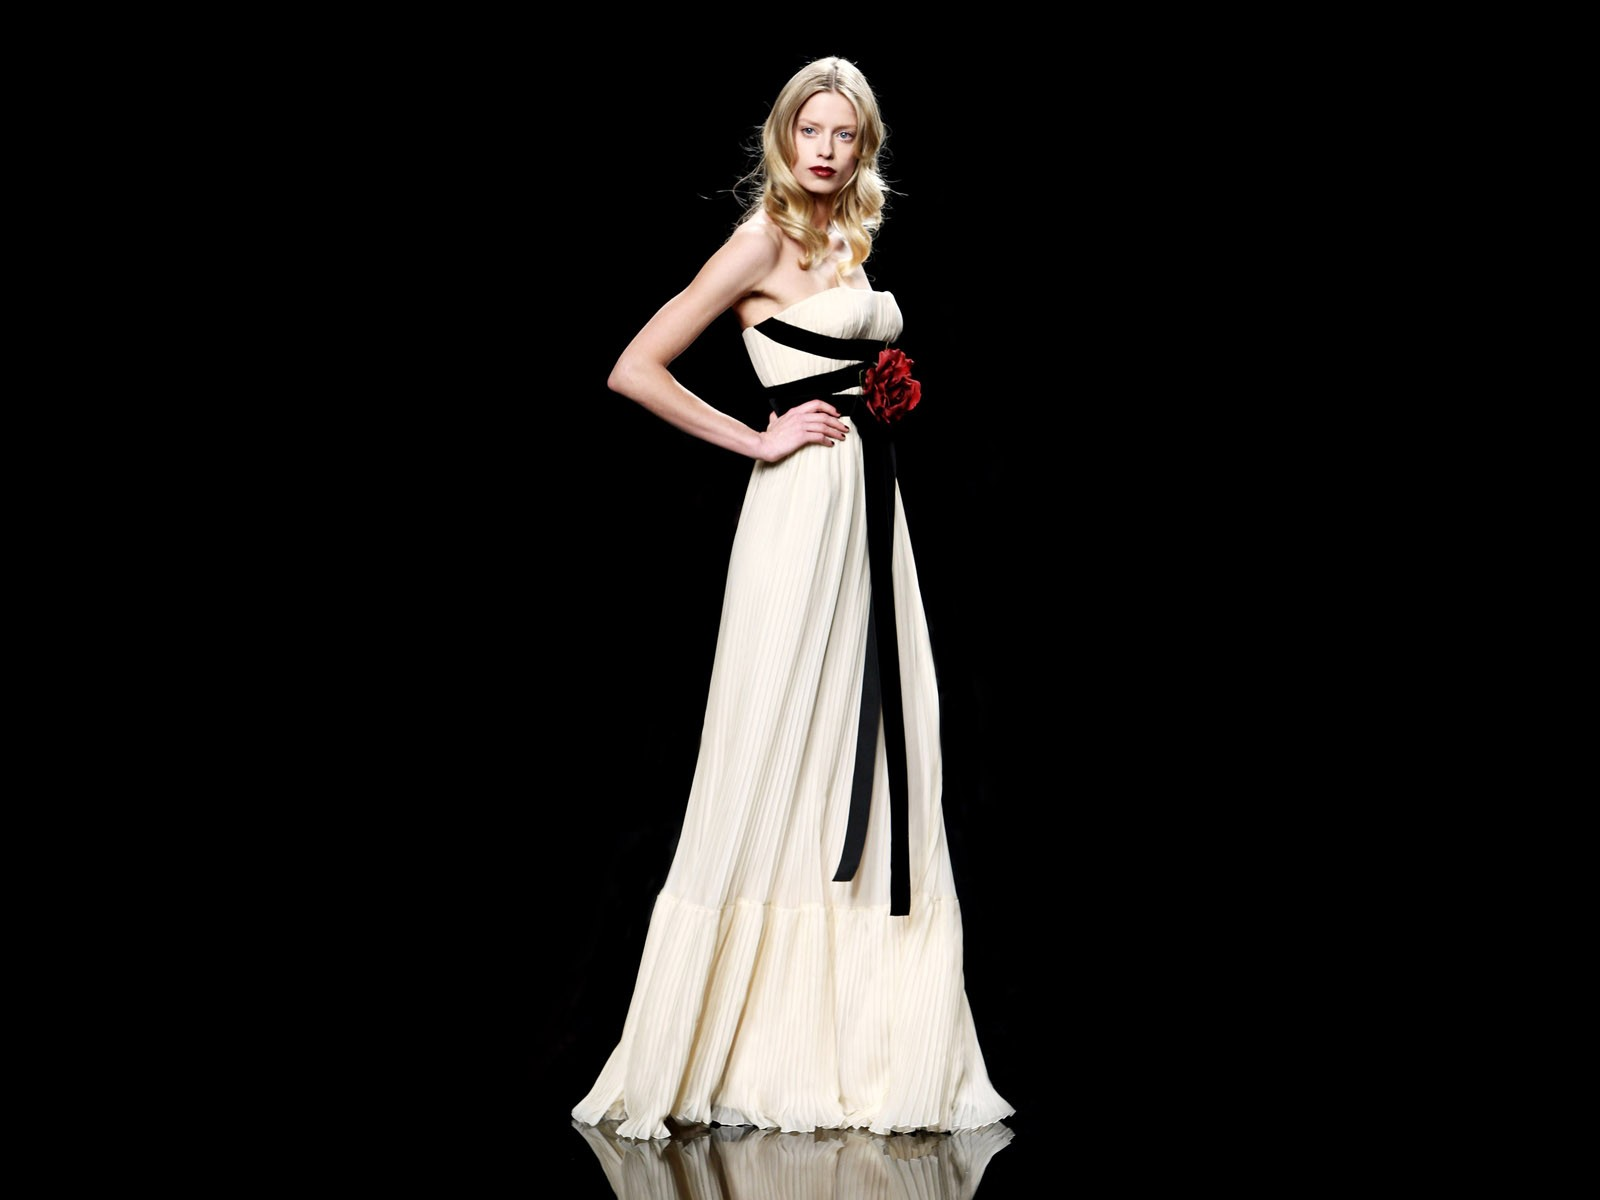 160050 in Western European fashion - Wikipedia 10